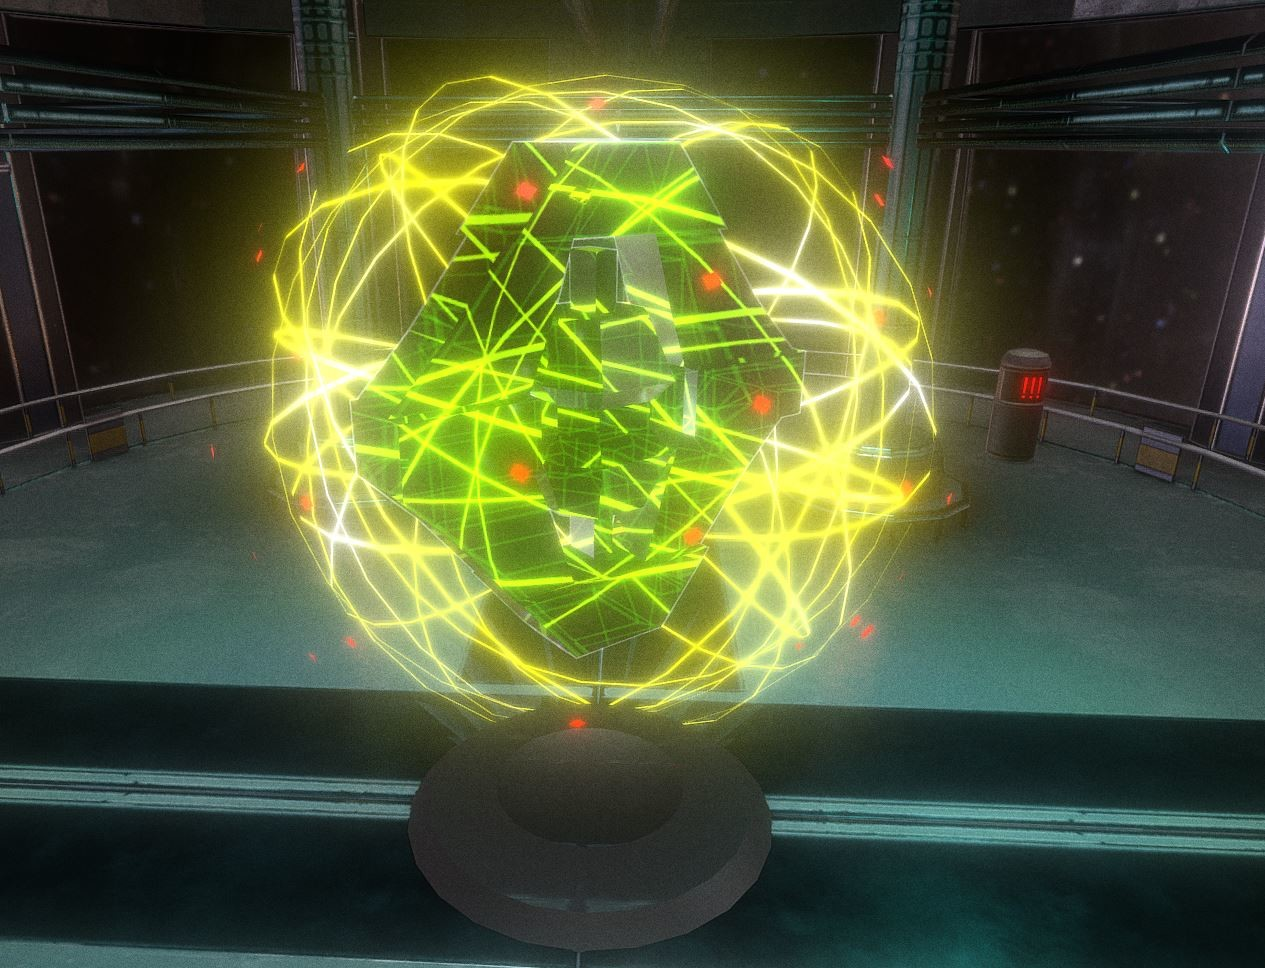 Radar hologram